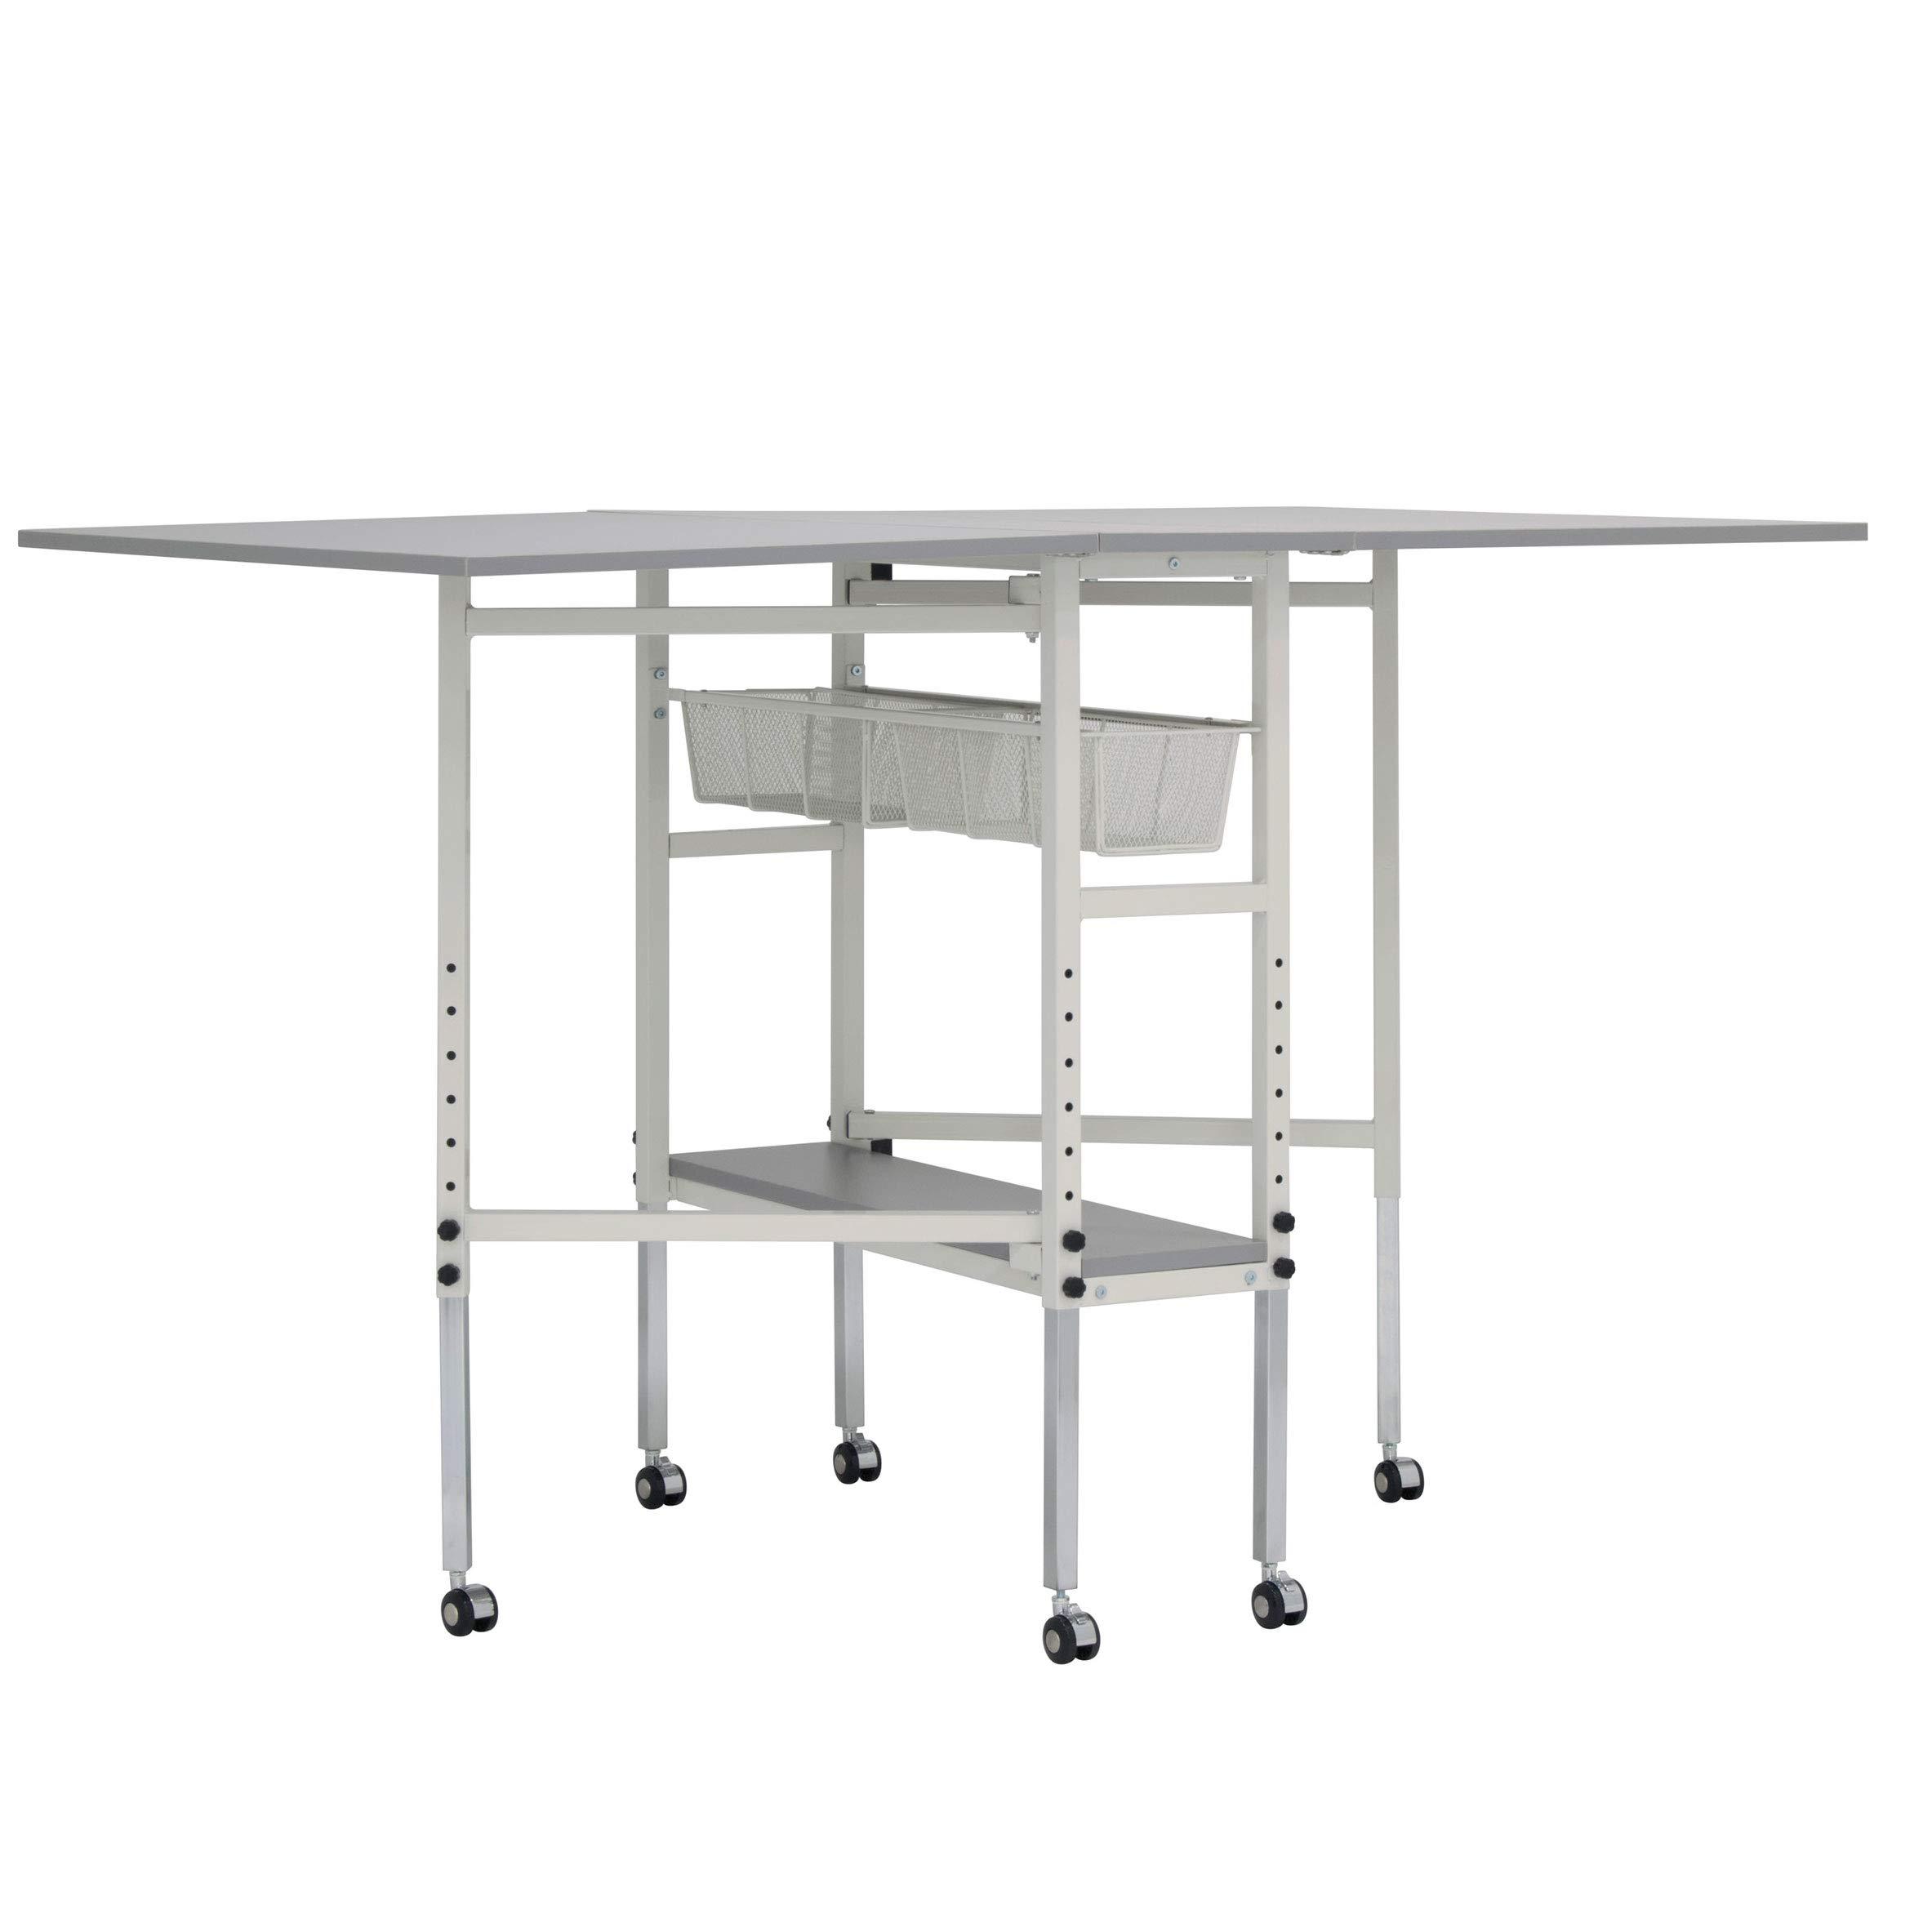 Sew Ready STDN-38011 Spree Craft & Cutting Table, 60'' W x 36'' D x 30.25'' - 39.25'' H, White/Grey by Sew Ready